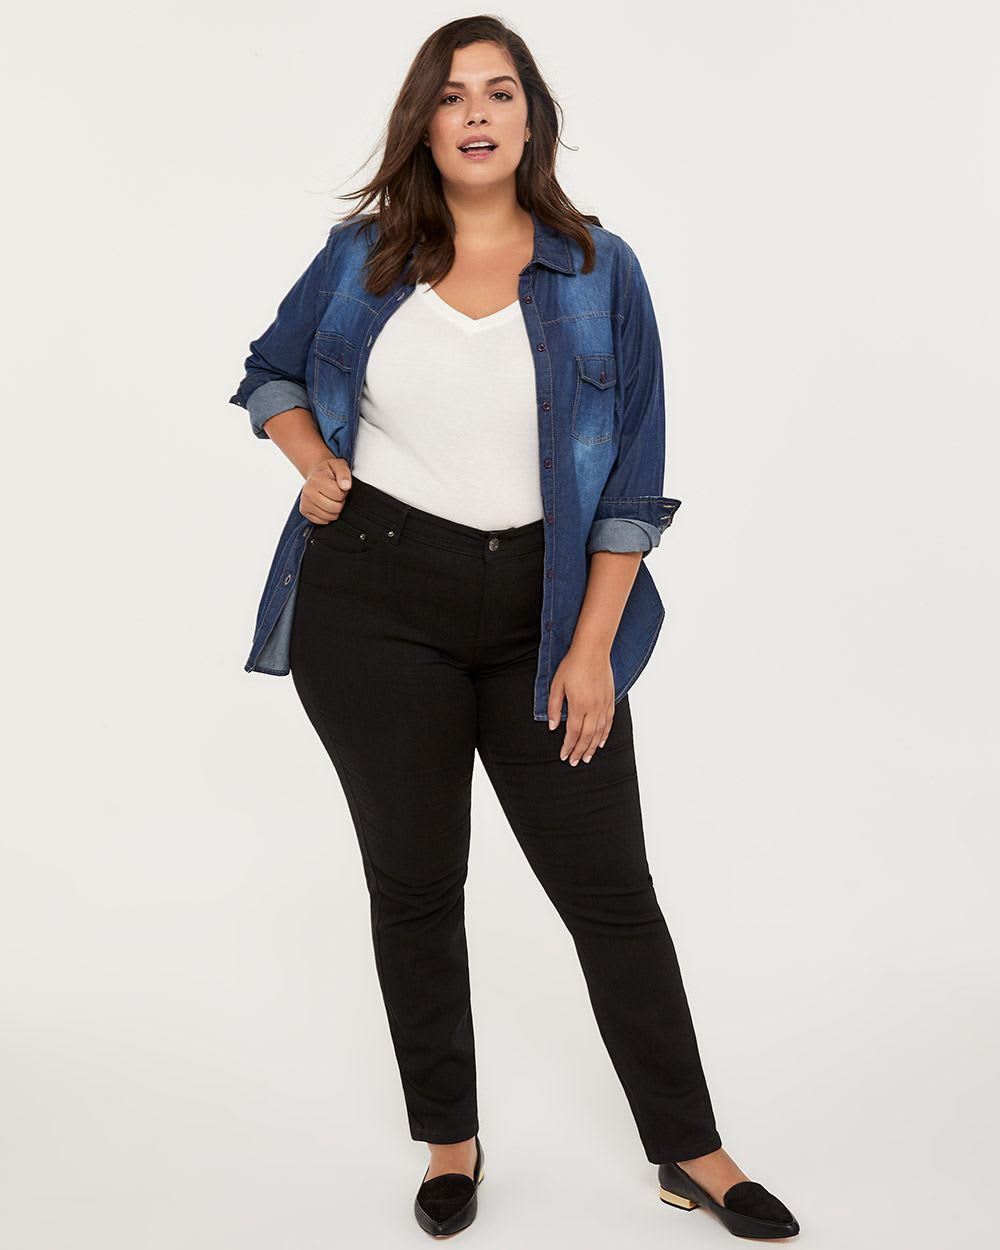 5c61c89f34faaf Addition Elle. Women's Petite Slightly Curvy Fit Straight Leg Black Jean ...